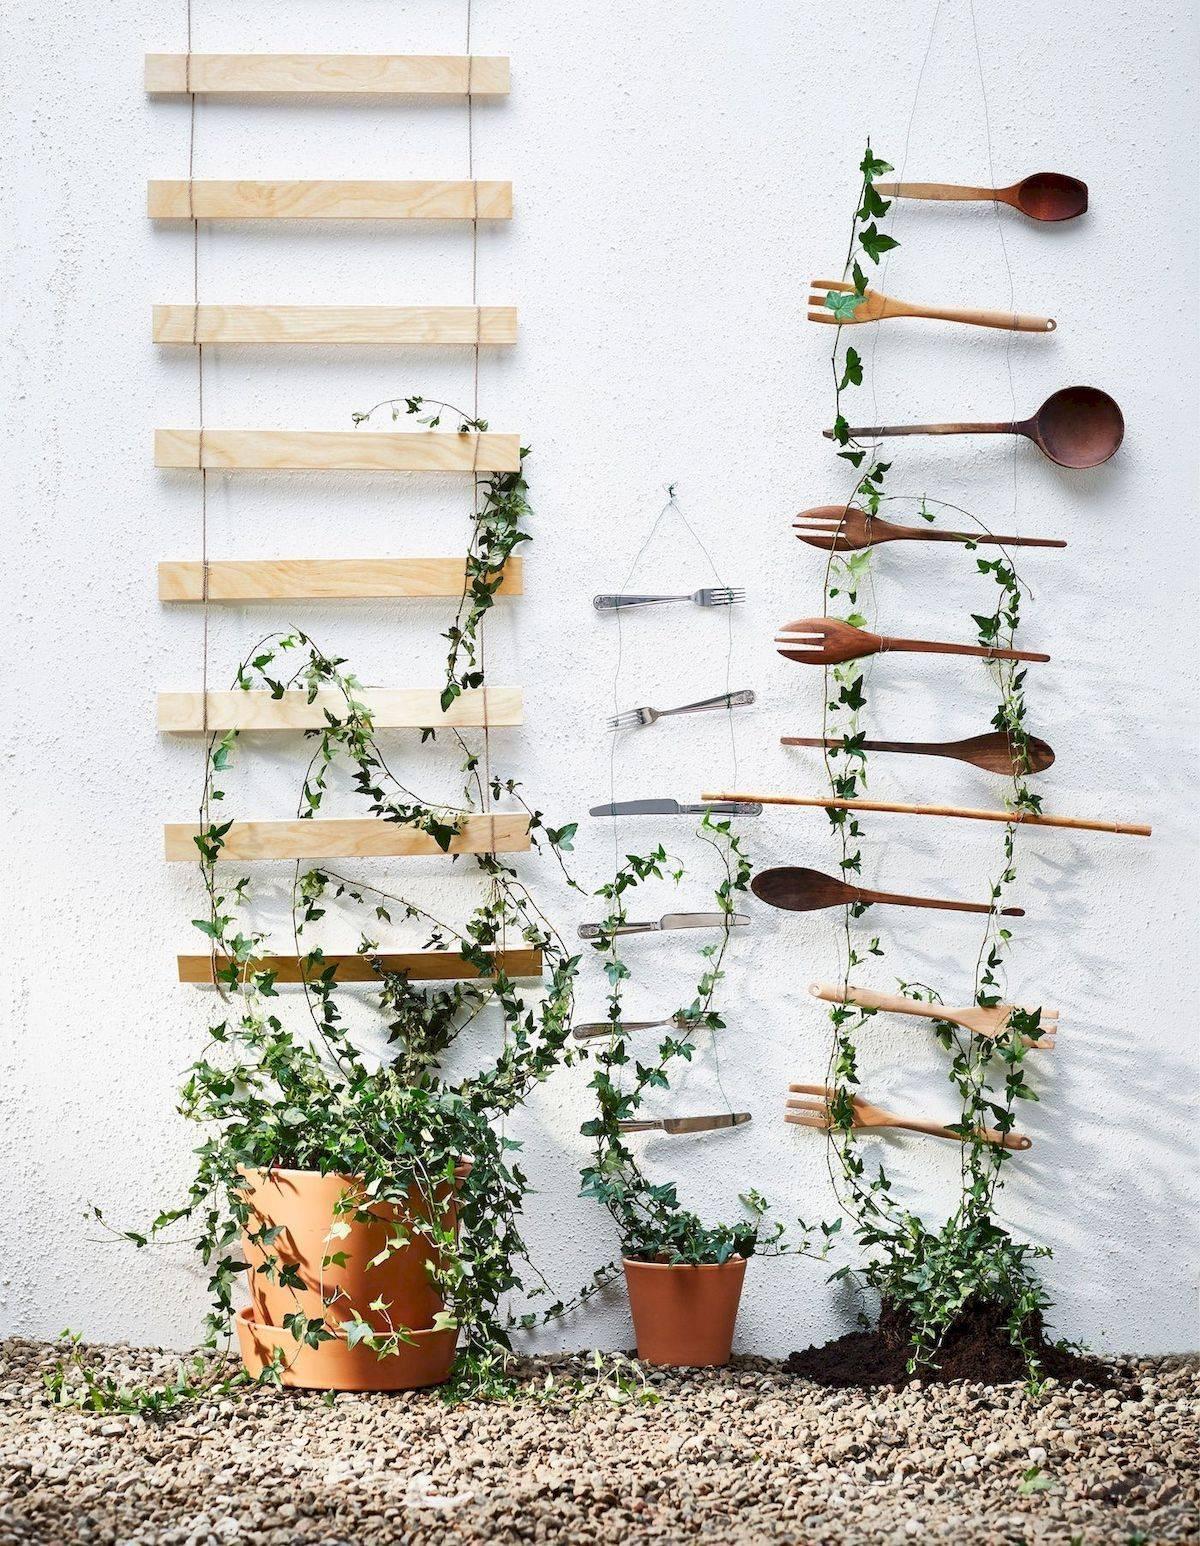 diy garden easy-692498880183684430